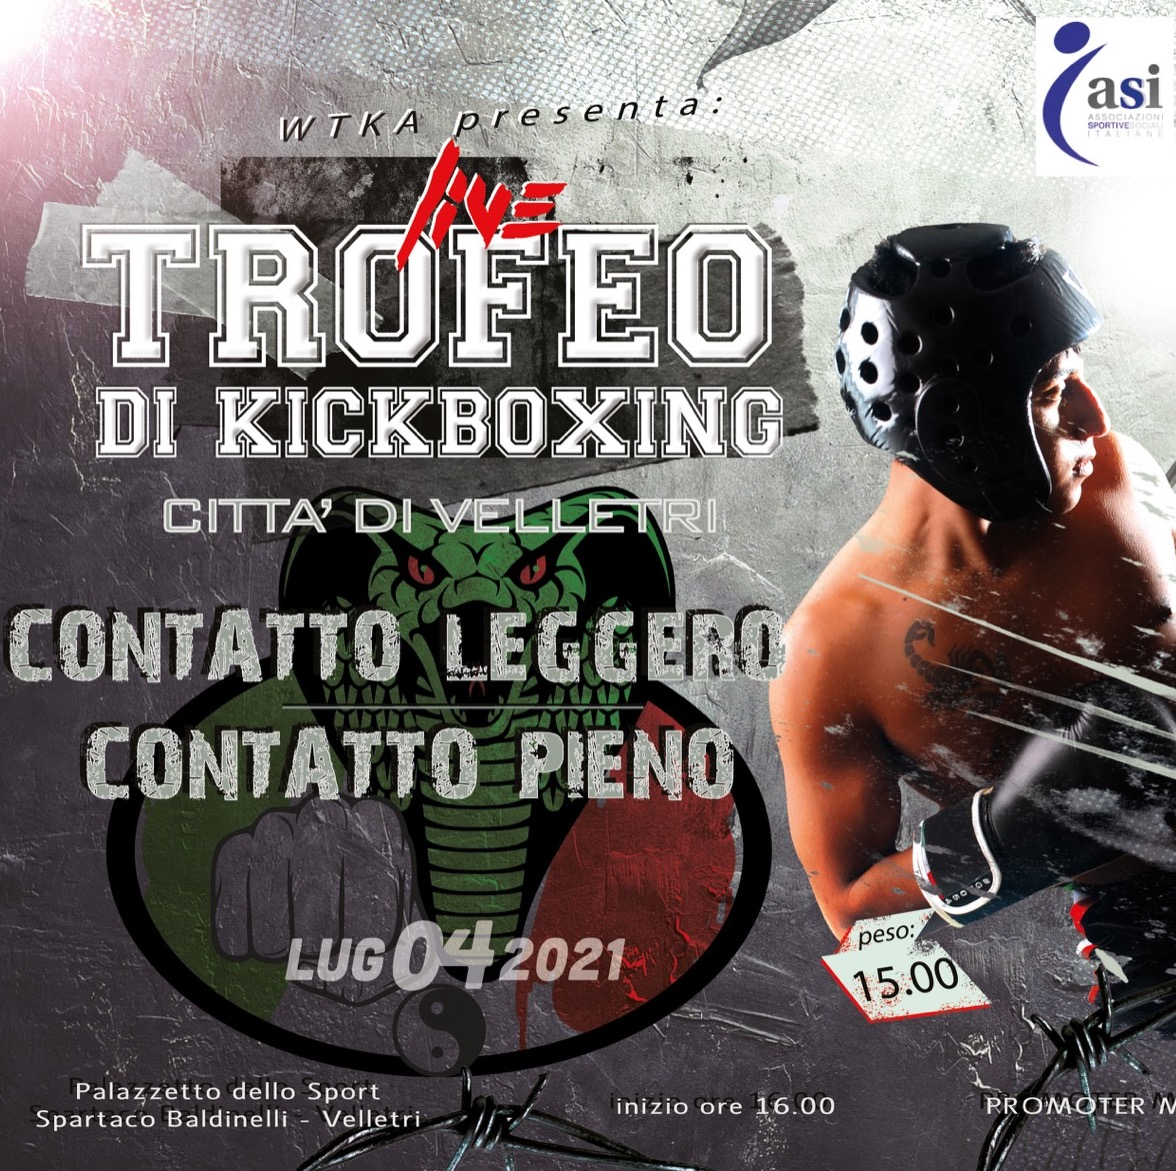 Trofeo di Kickboxing WTKA